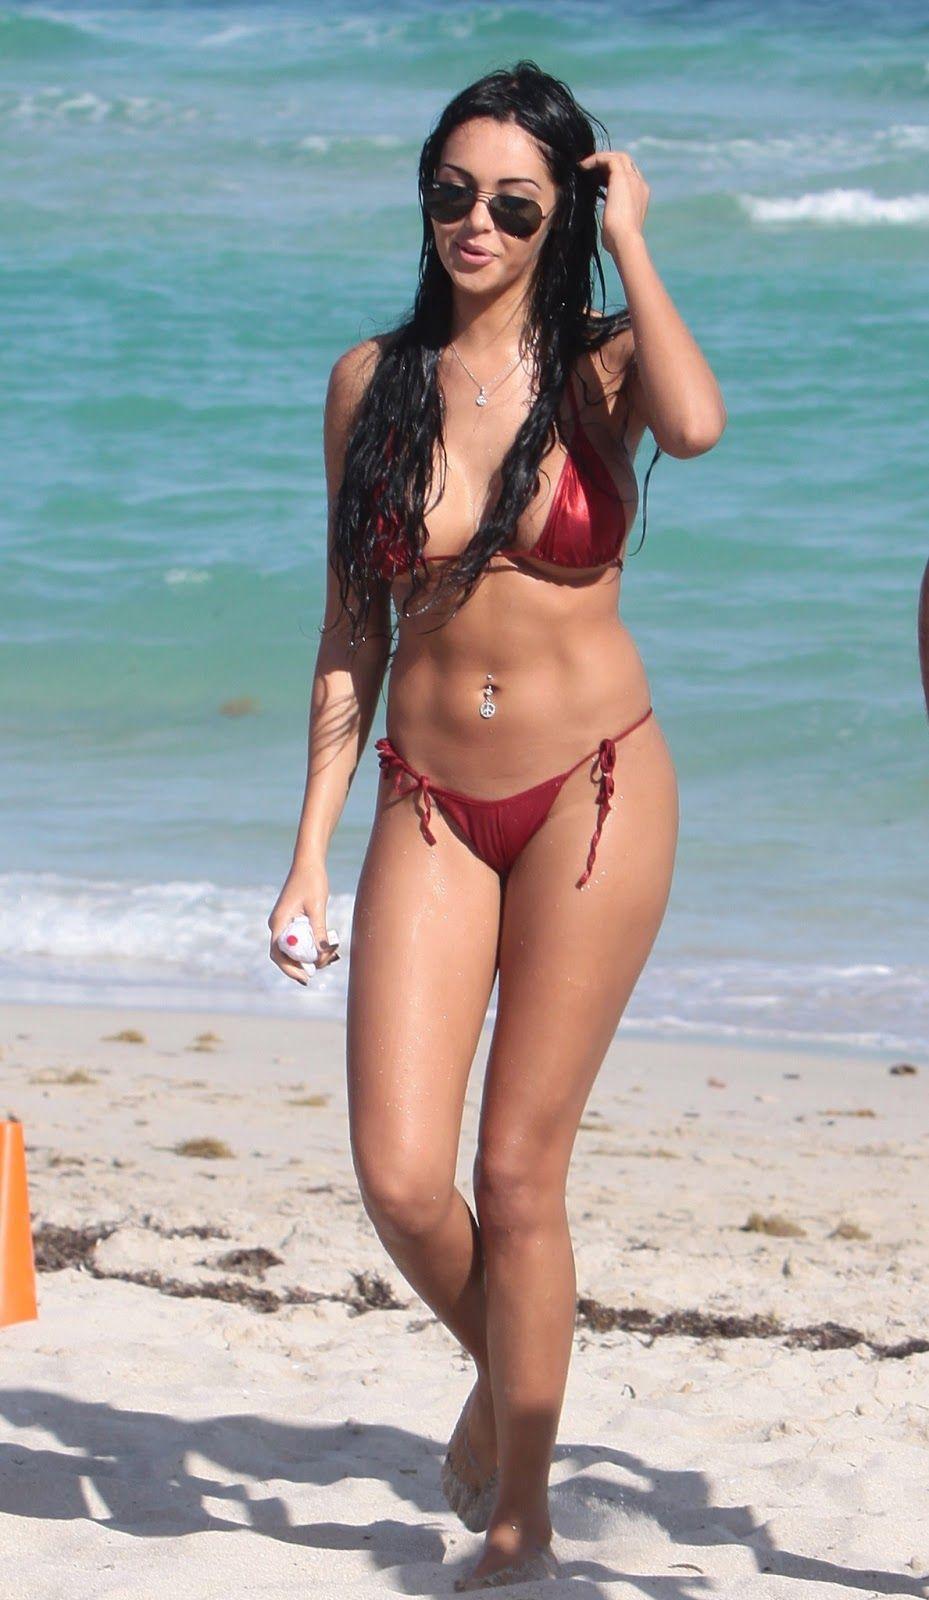 Bikini Nabilla Benattia nude (33 foto and video), Pussy, Bikini, Feet, swimsuit 2018